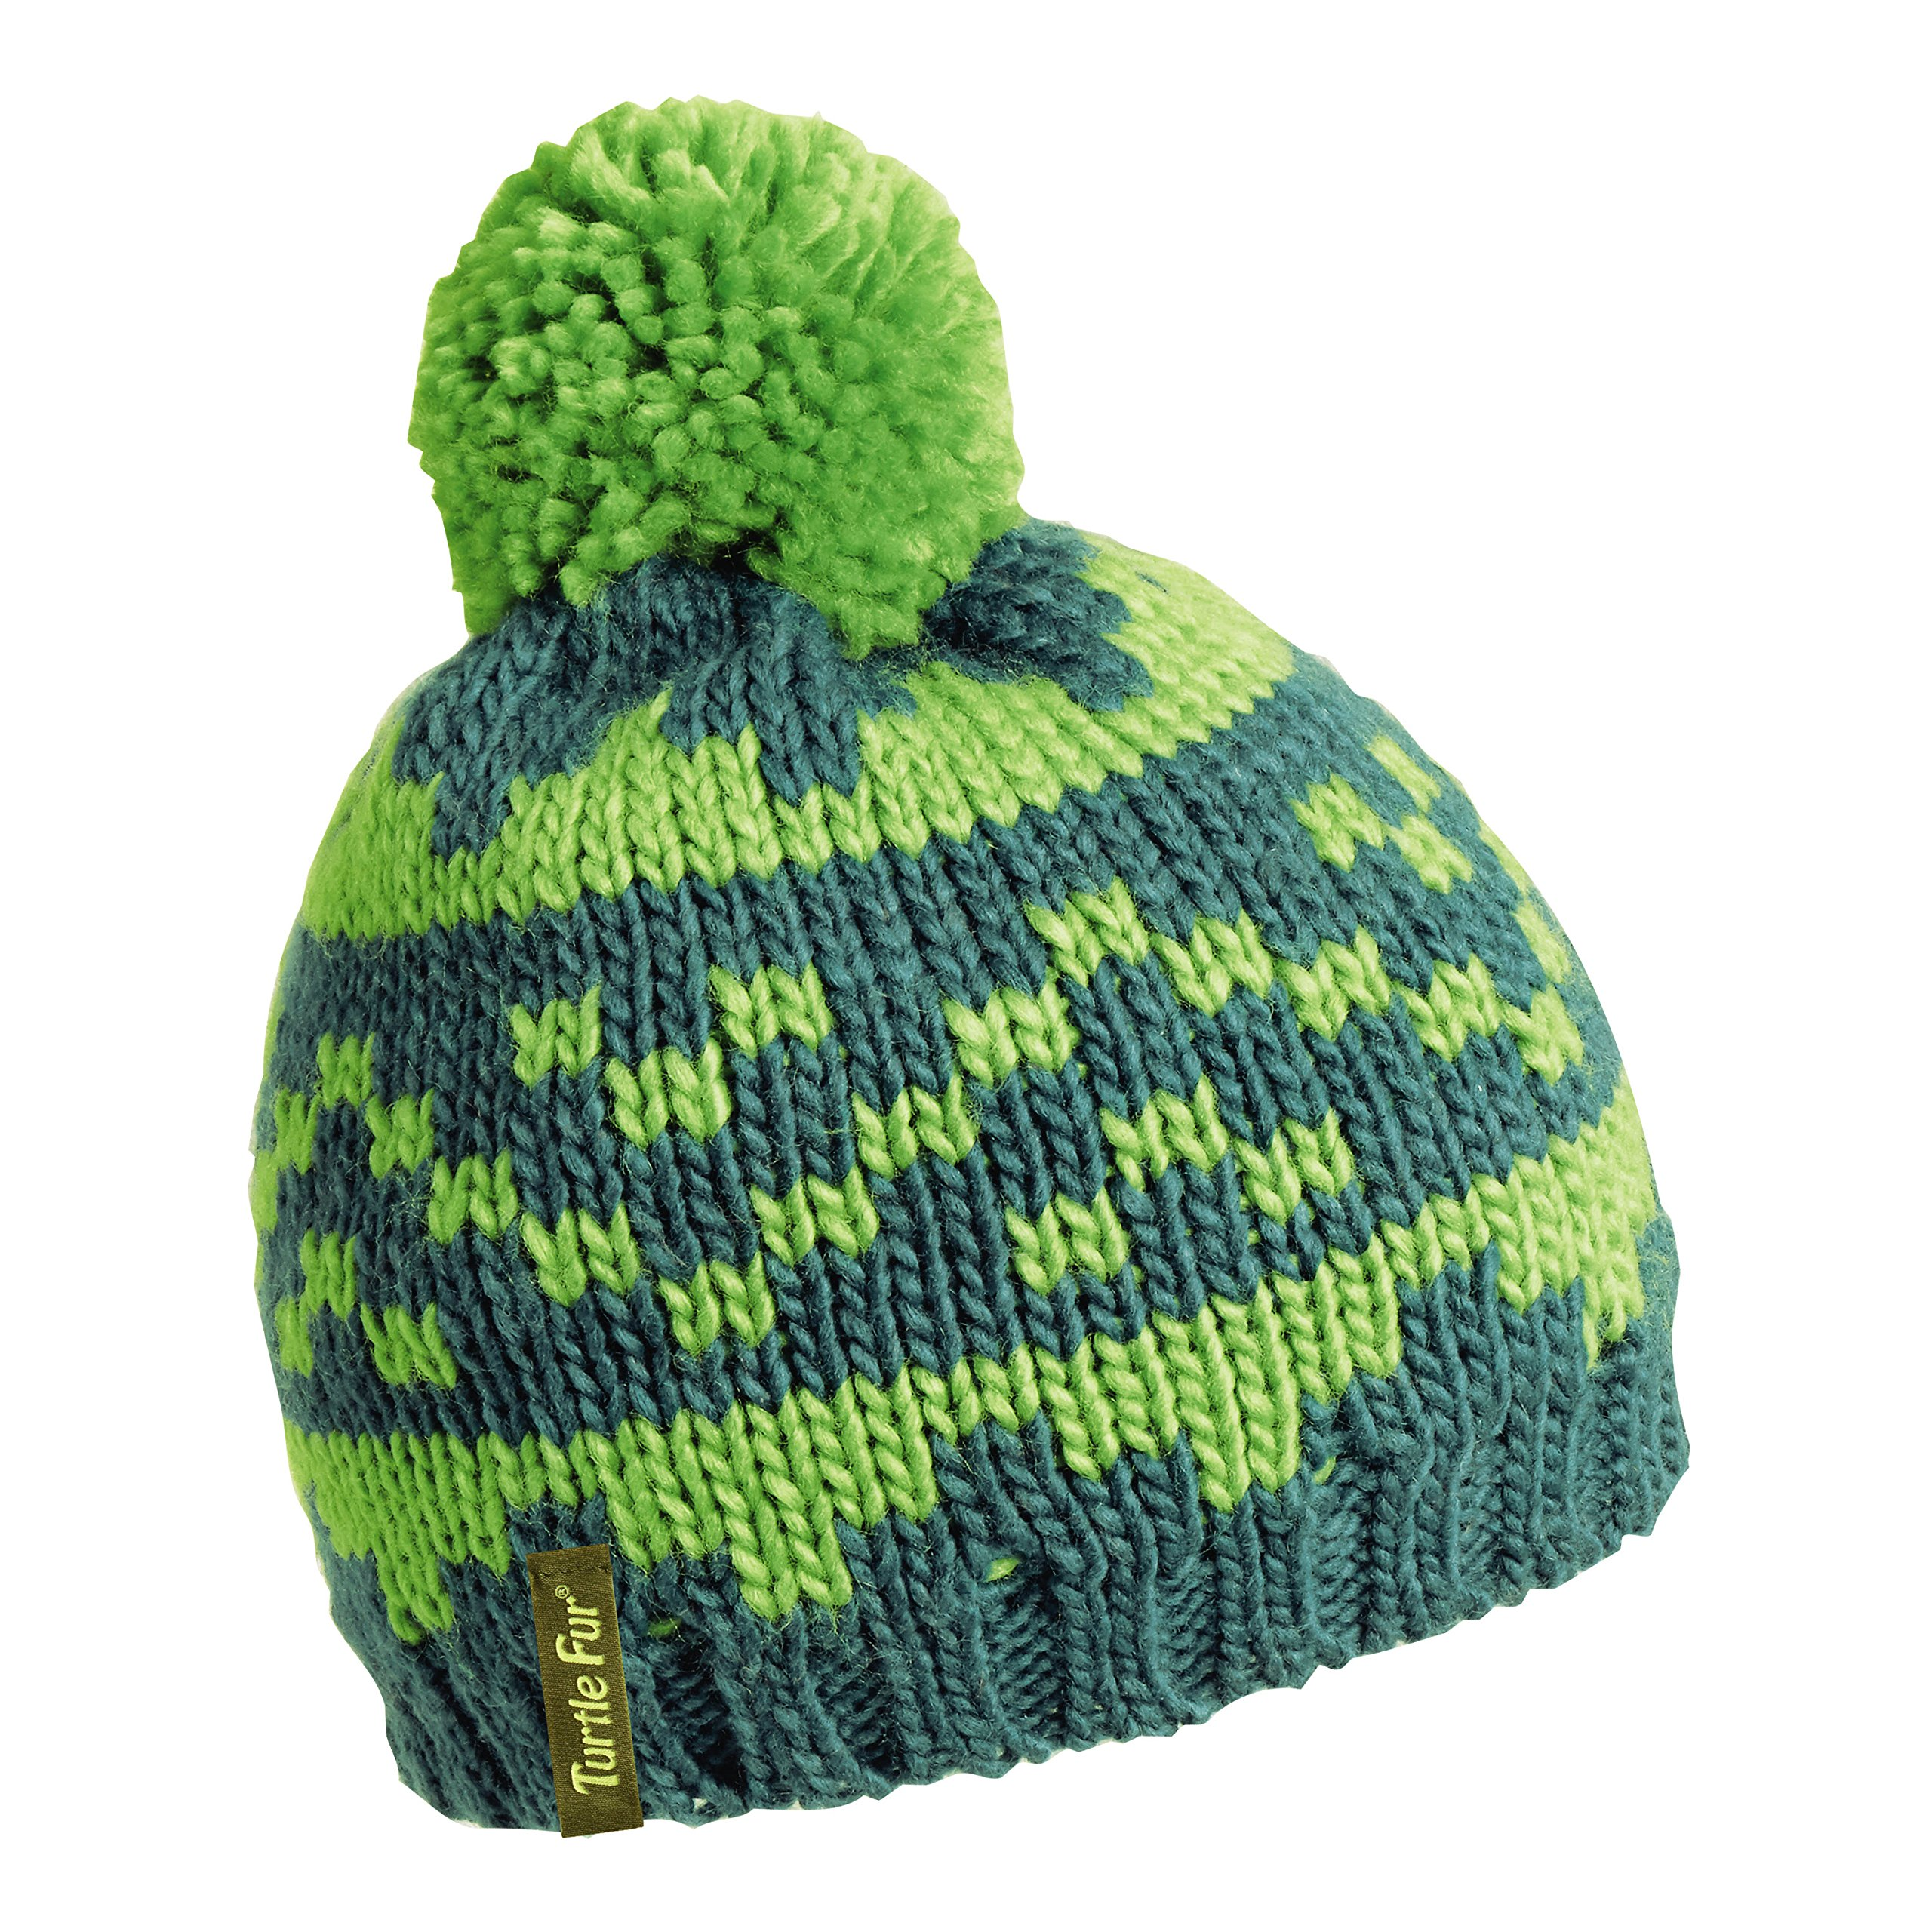 7dfbdf79bde Turtle Fur Side Step Boy s Classic Pom Winter Hat Evergreen